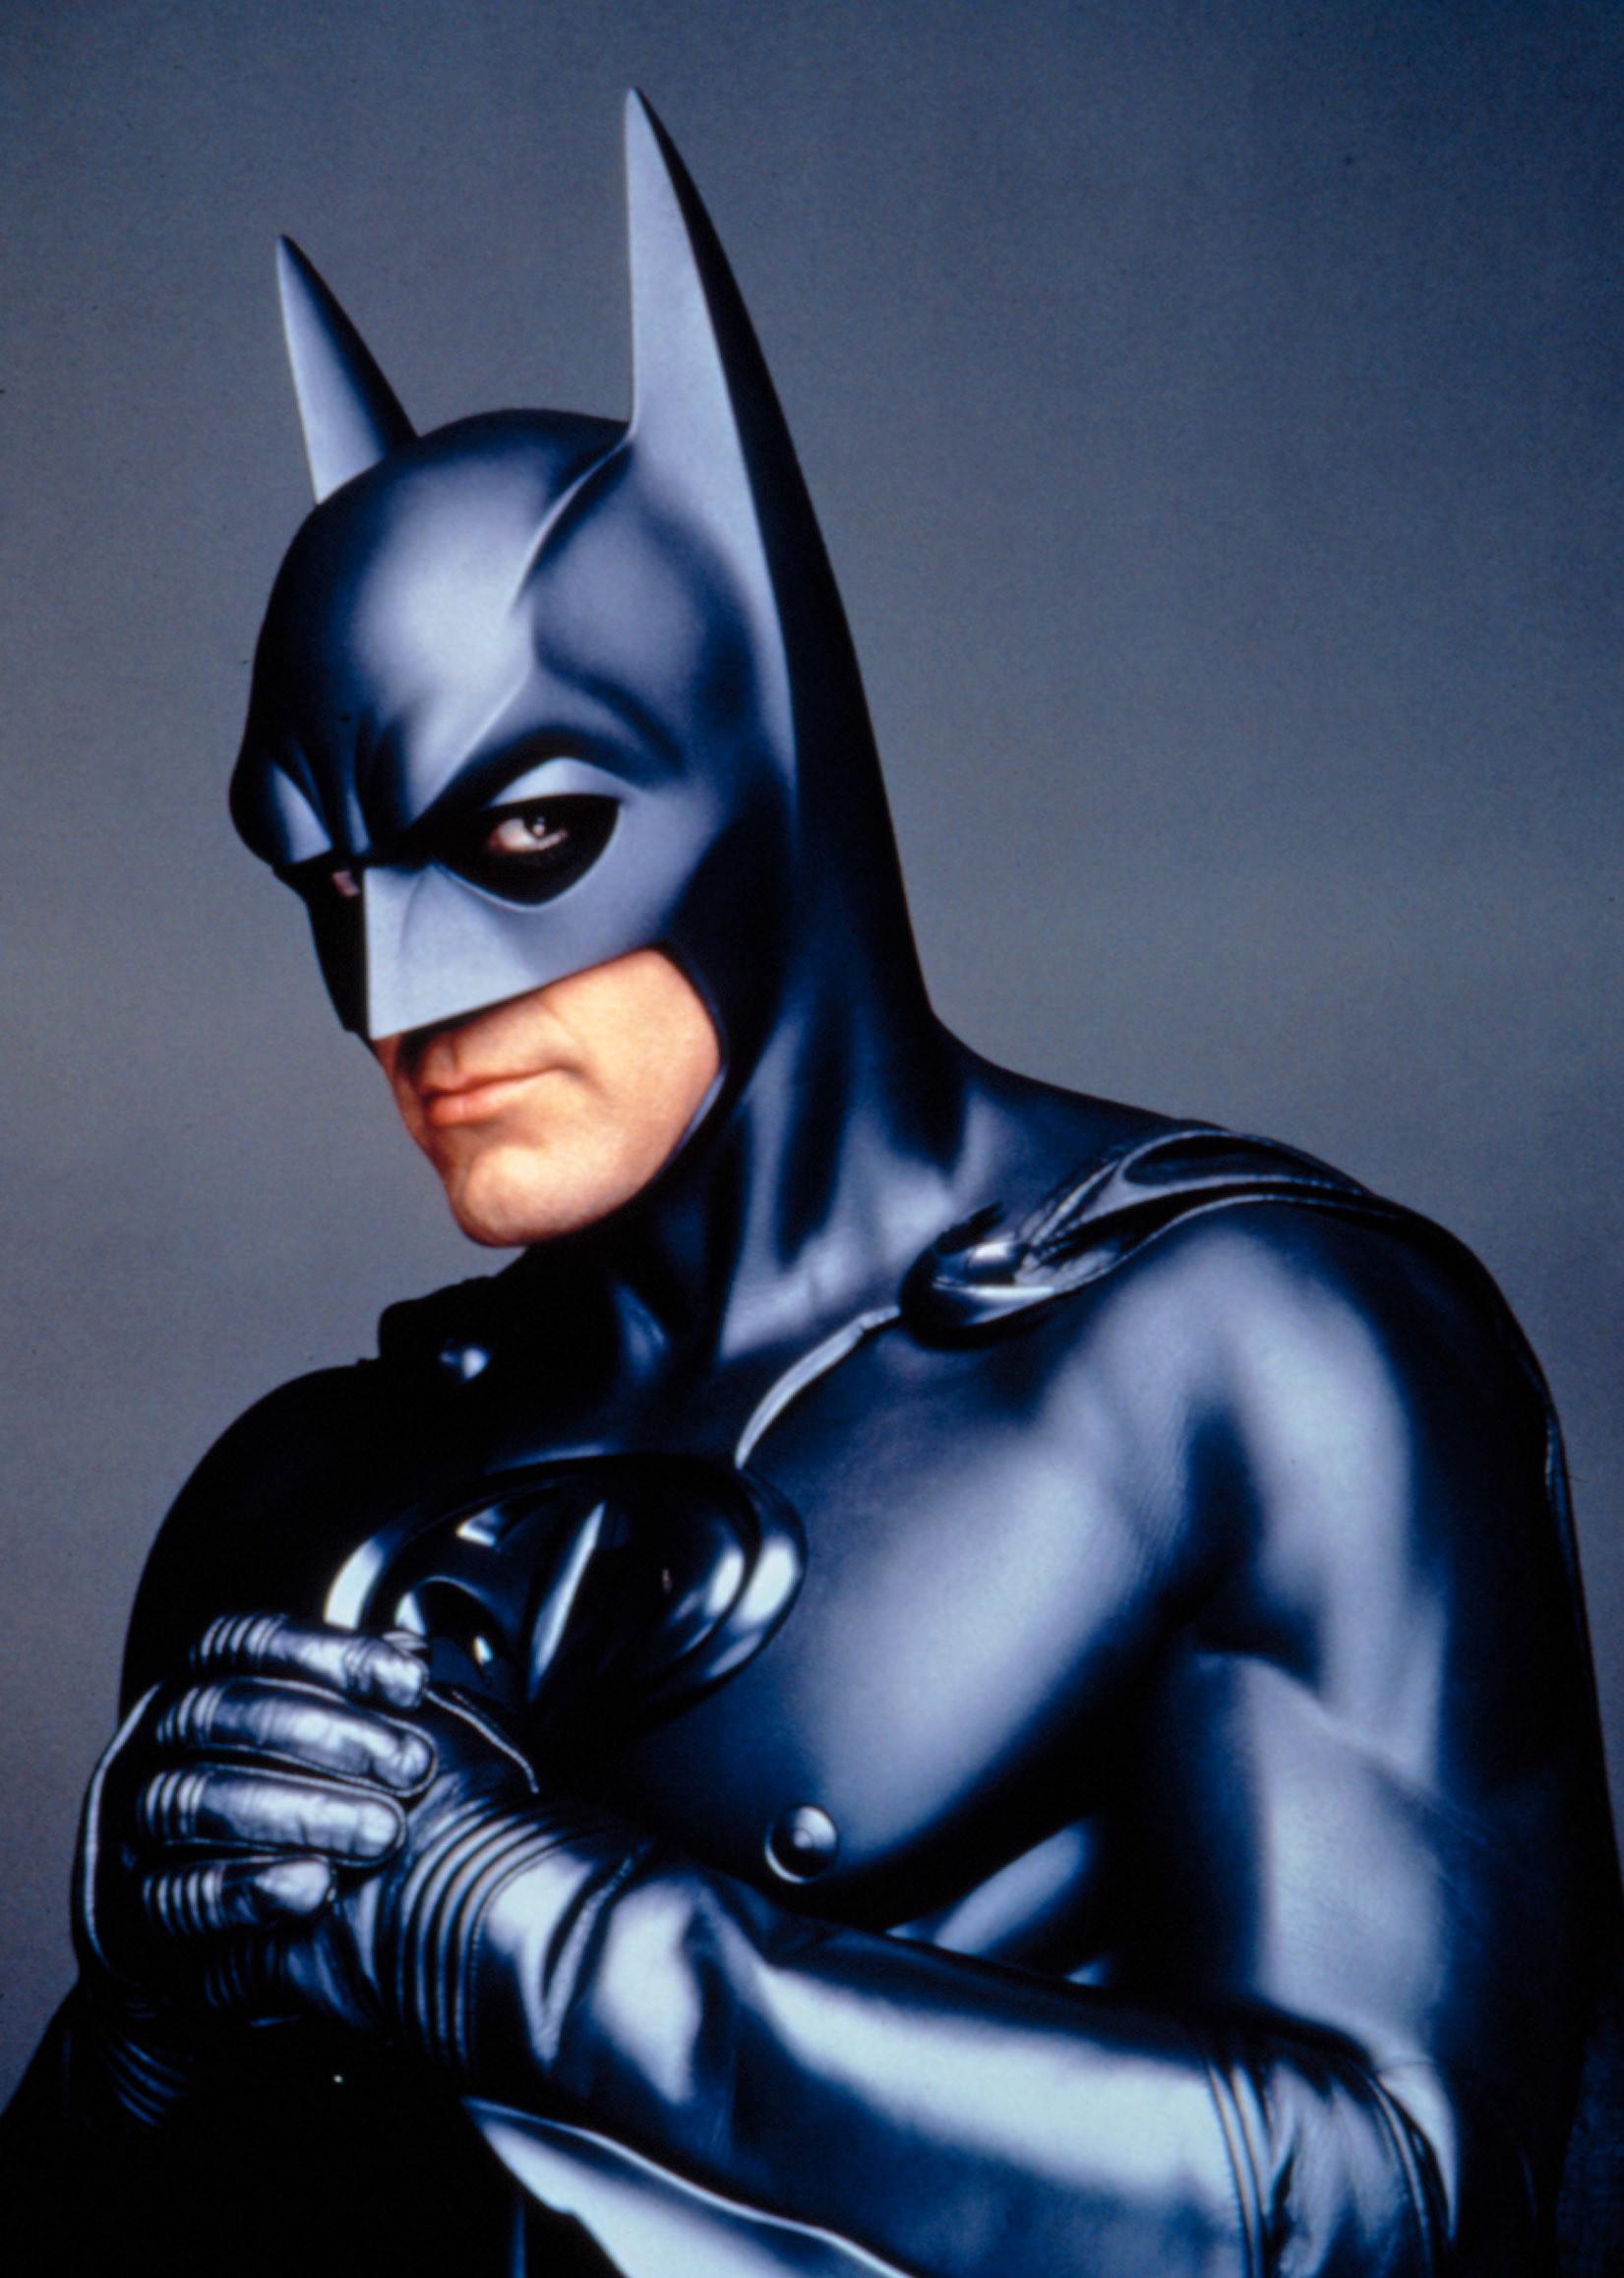 BATMAN AND ROBIN, George Clooney, 1997